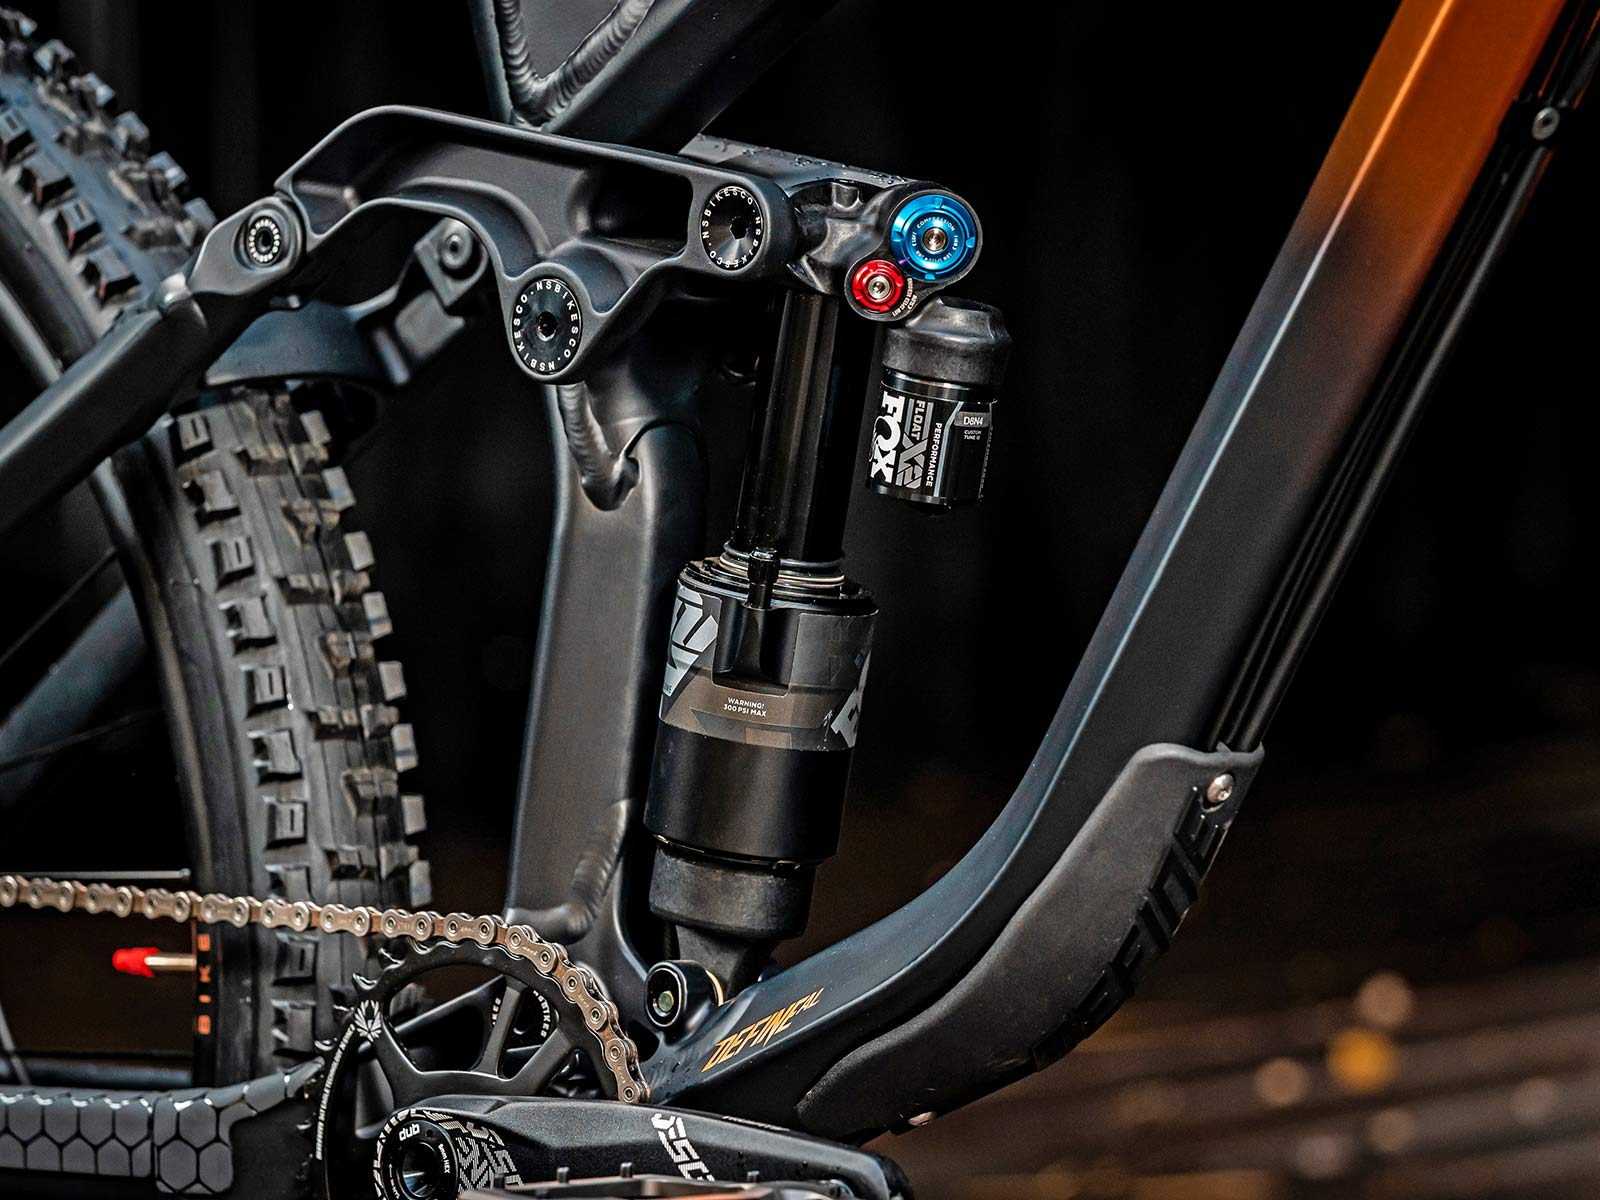 NS Bikes Define AL 170 long-travel mullet enduro plus all-mountain bike, photo by Piotr Jurczak, suspension detail